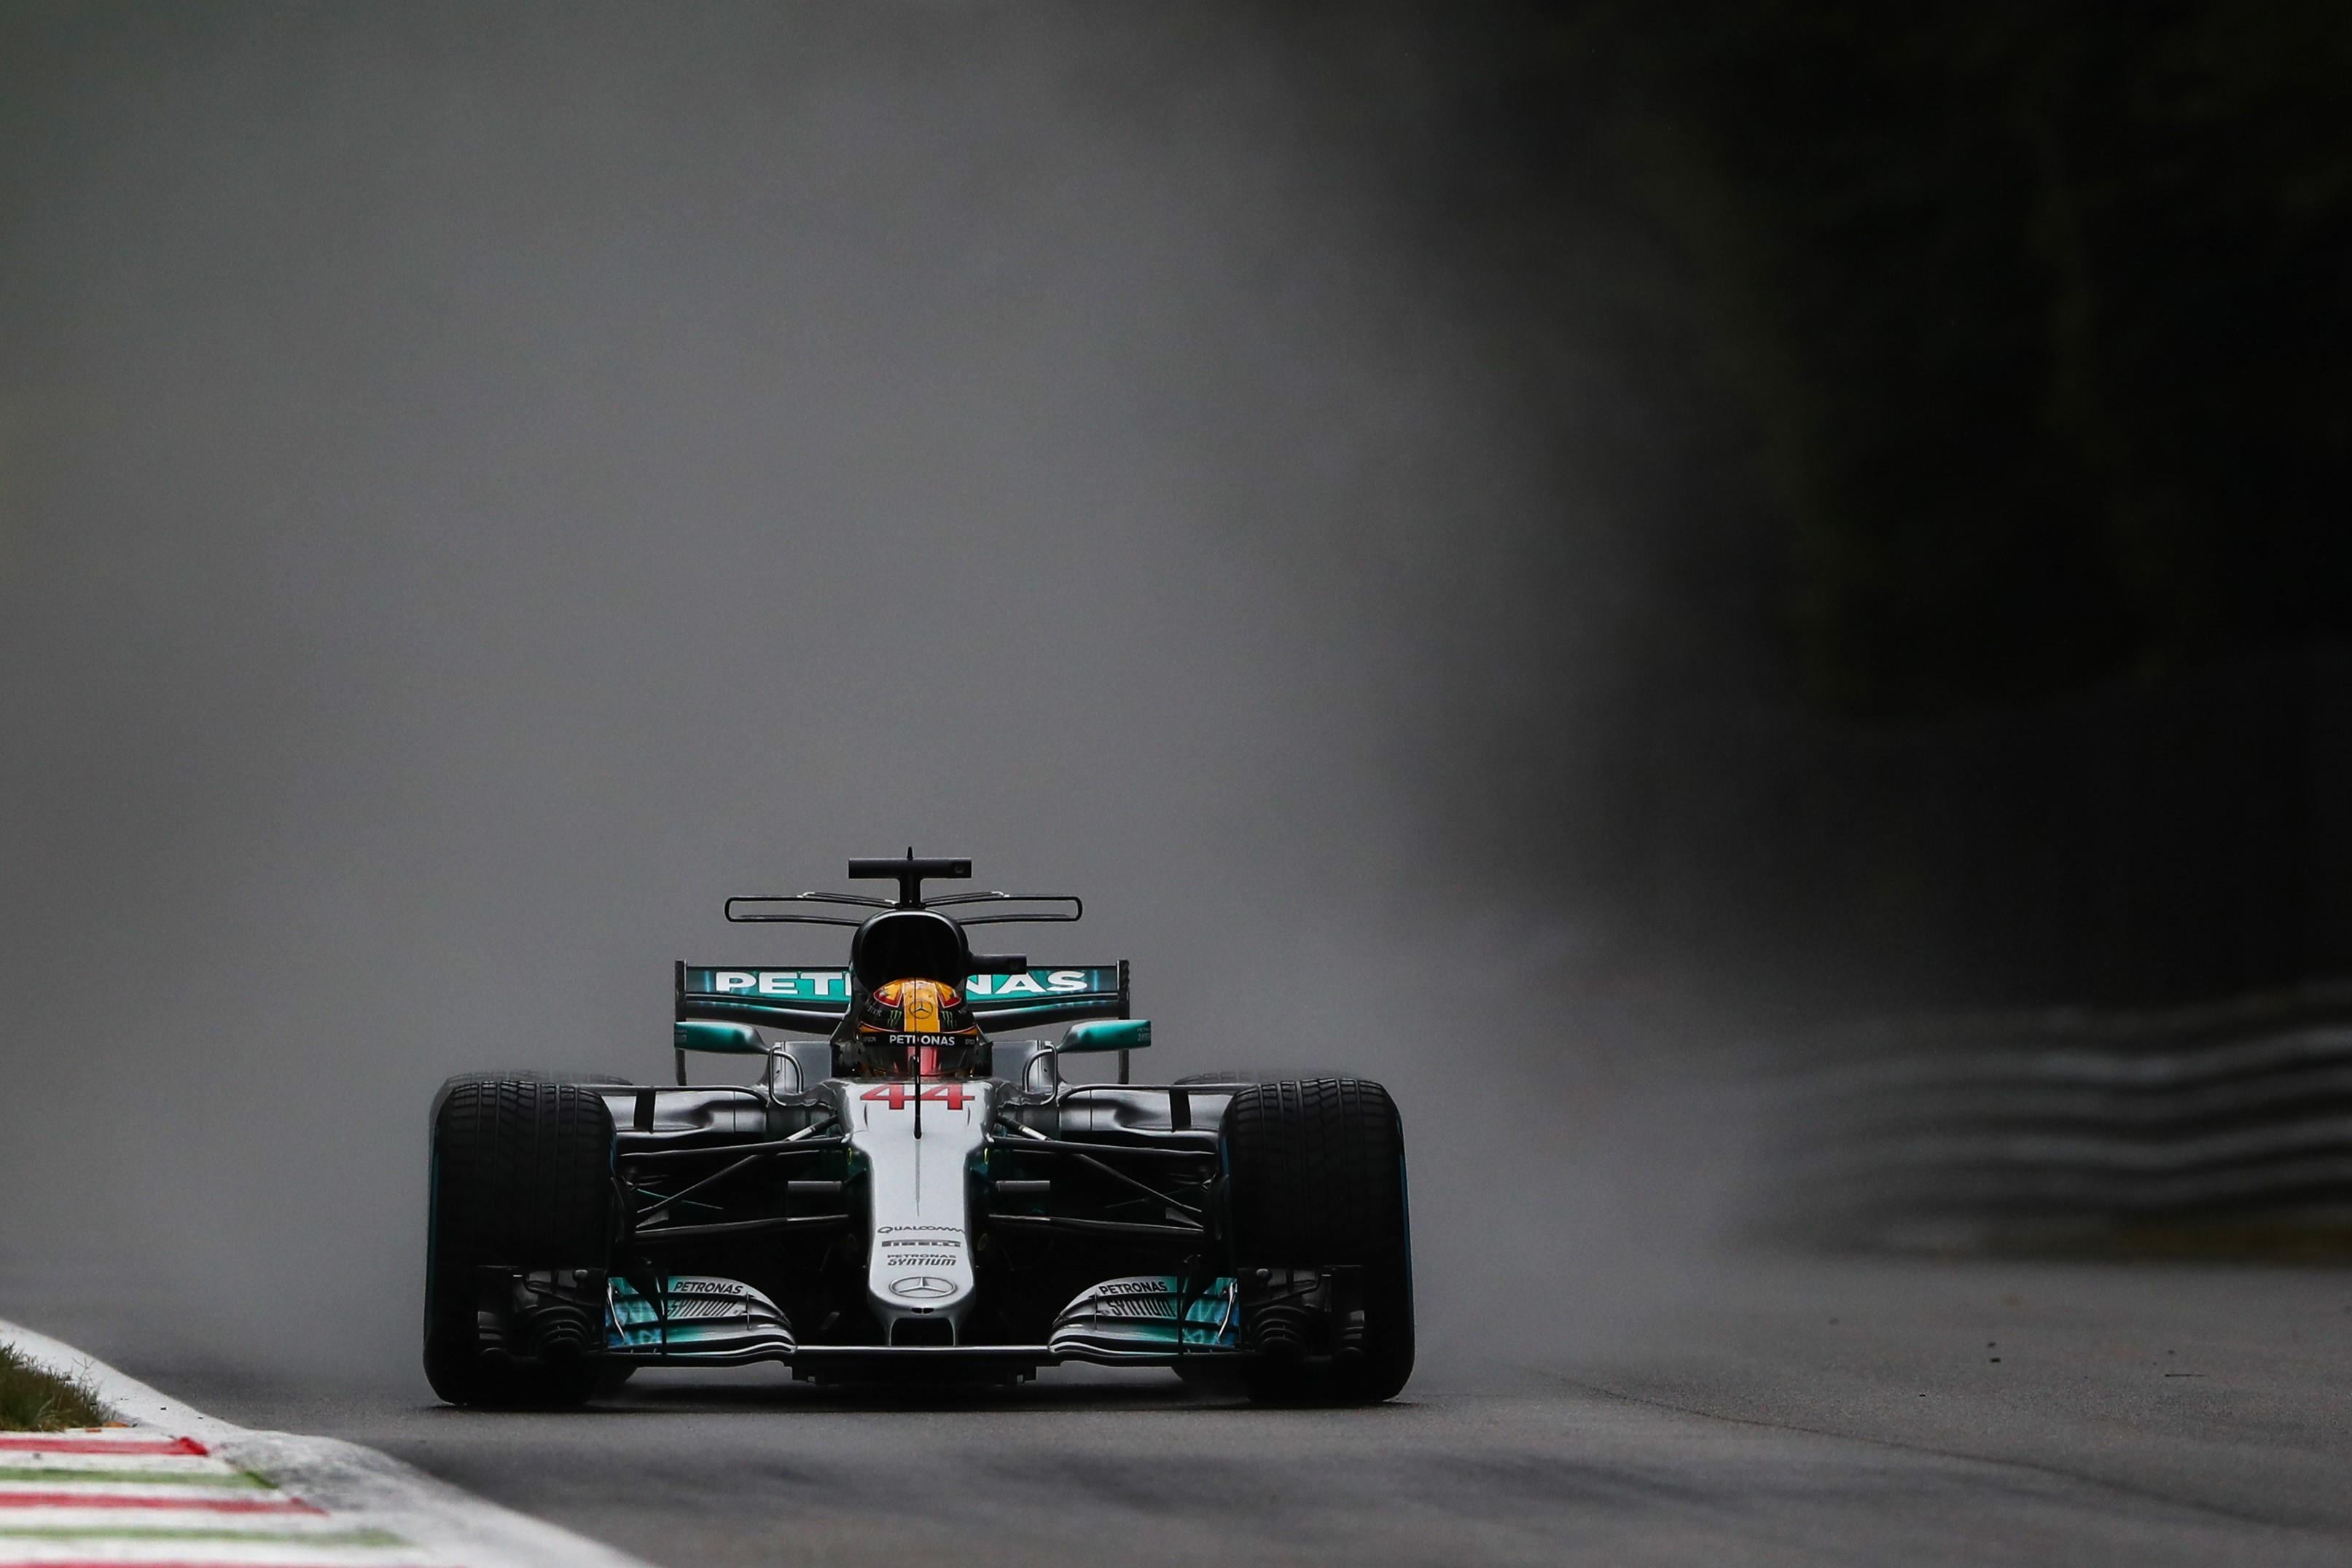 Lewis Hamilton (Mercedes) au Grand Prix de Italie 2017